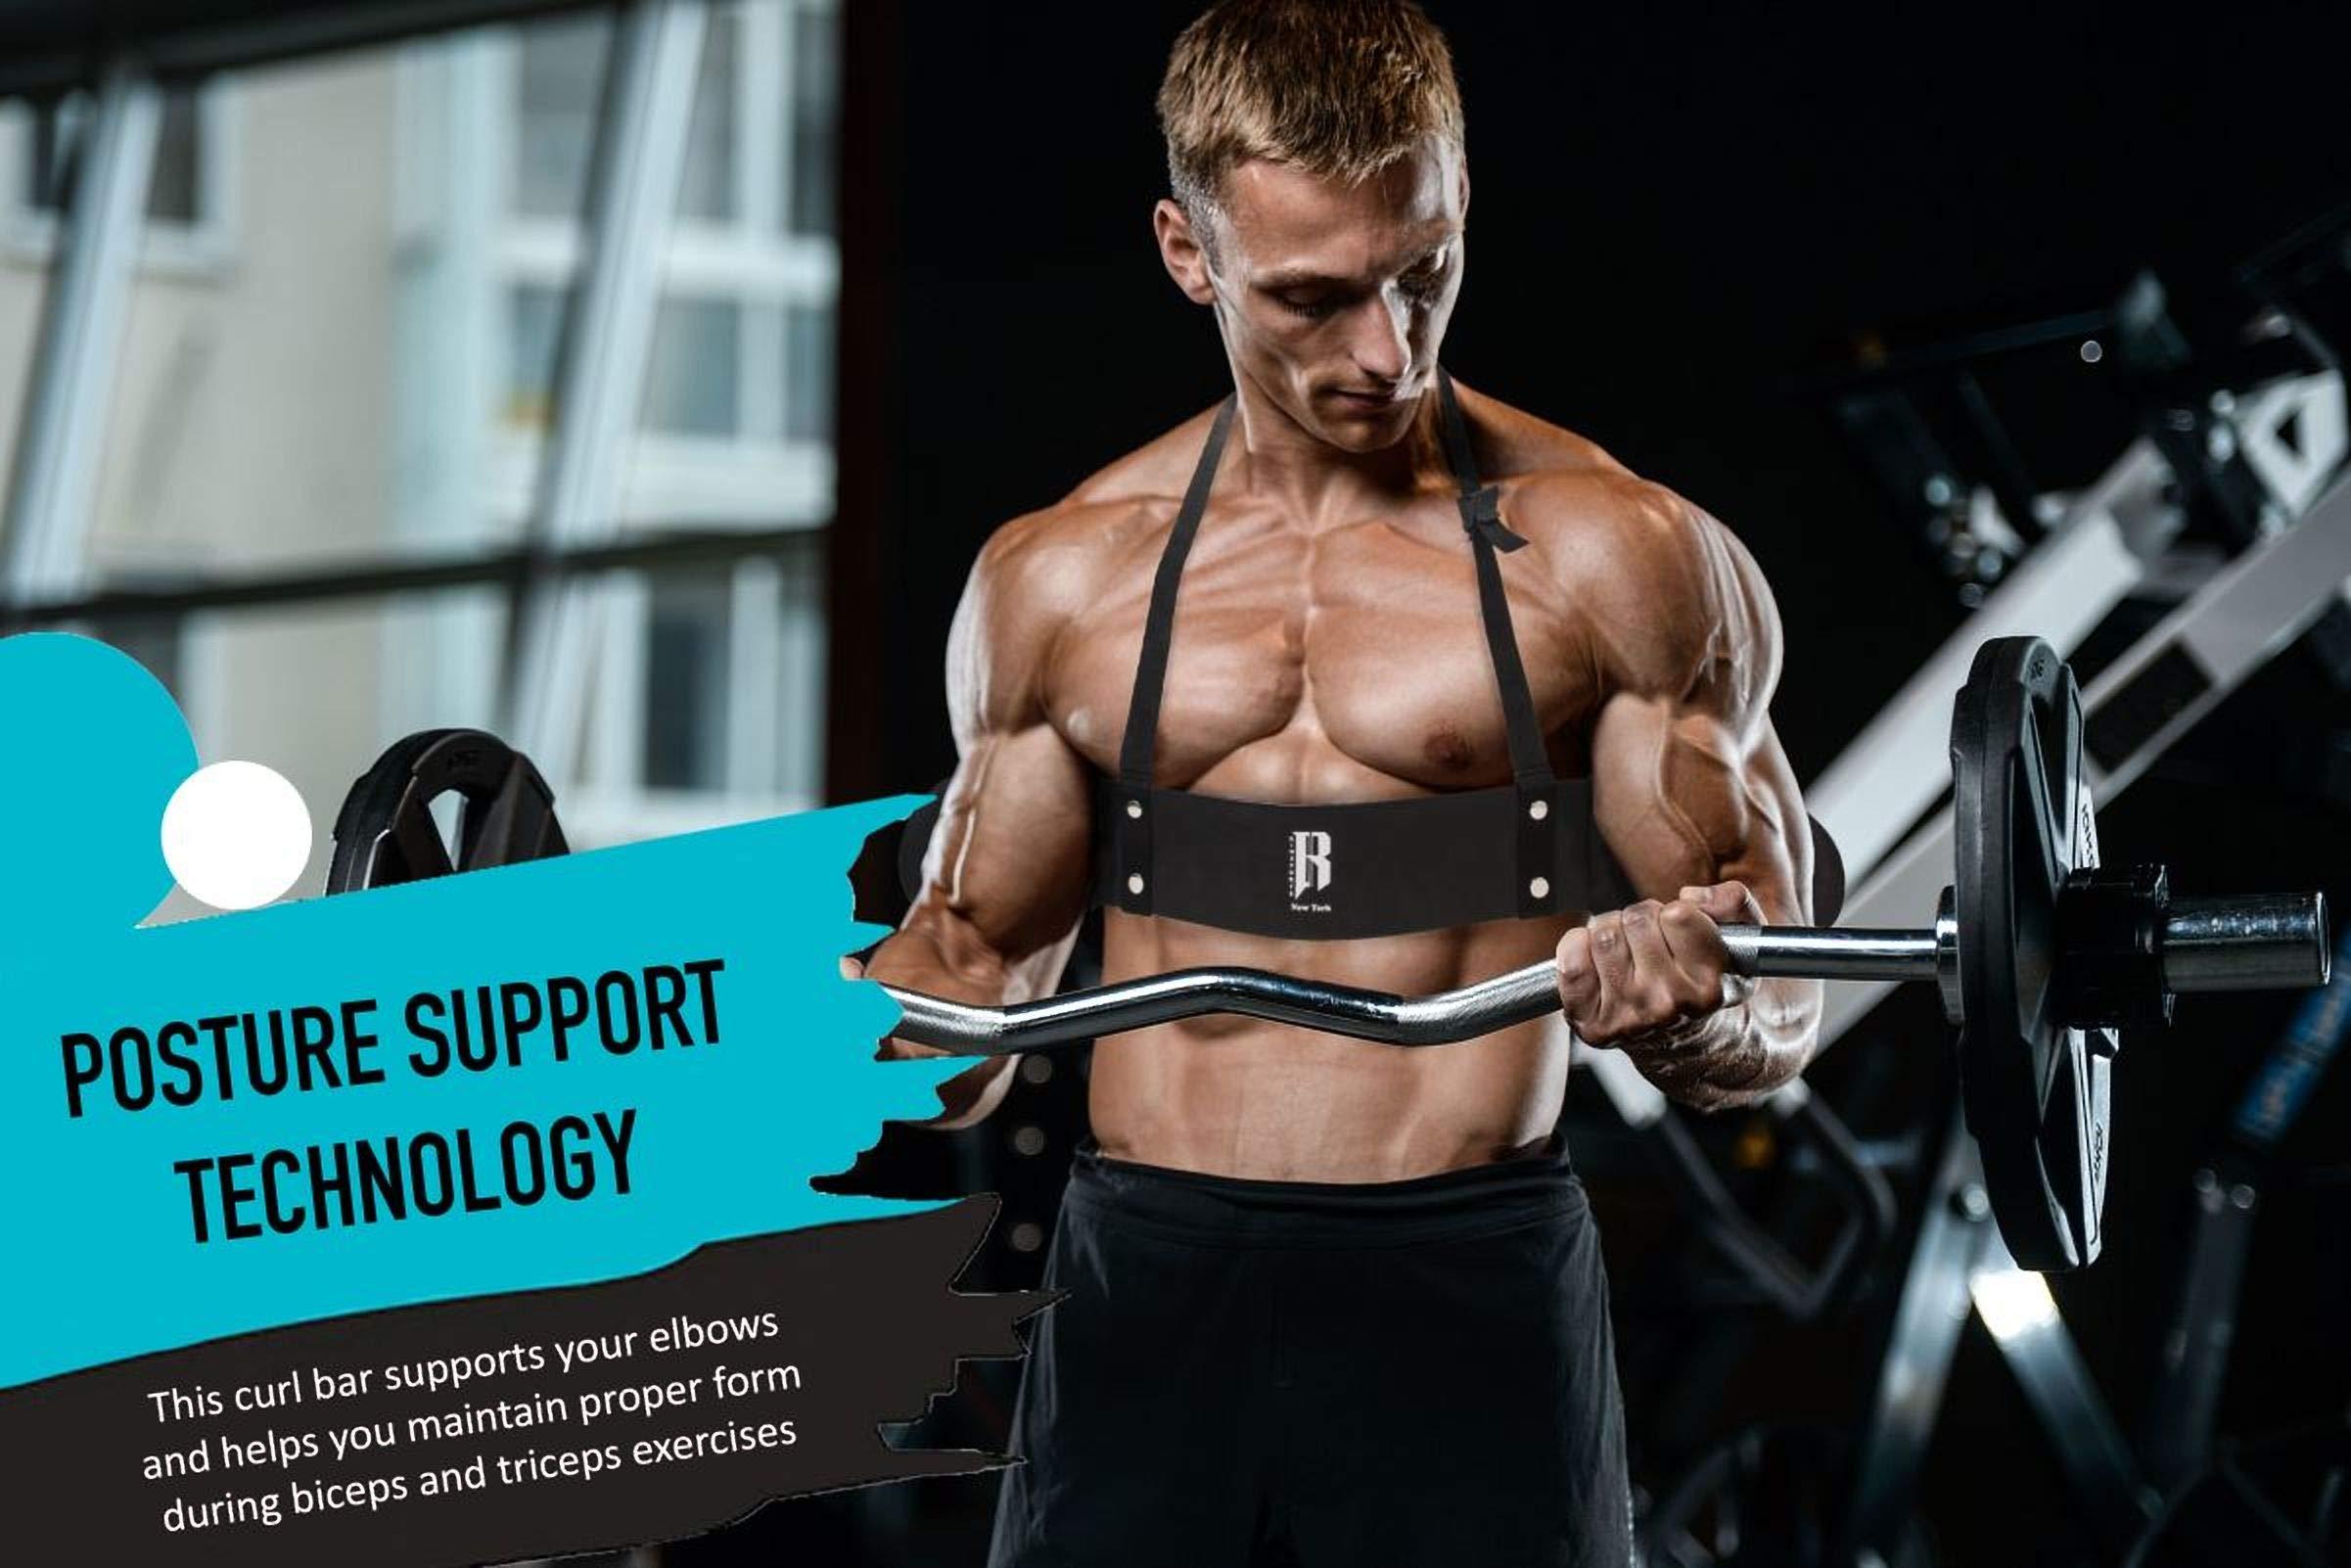 RIMSports Arm Blaster for Biceps Best Muscle Bicep Blaster for Bicep and Tricep Workout Ideal Biceps Isolator /& Heavy Duty Elite Muscle Arm Blaster for Bodybuilders /& Weightlifters